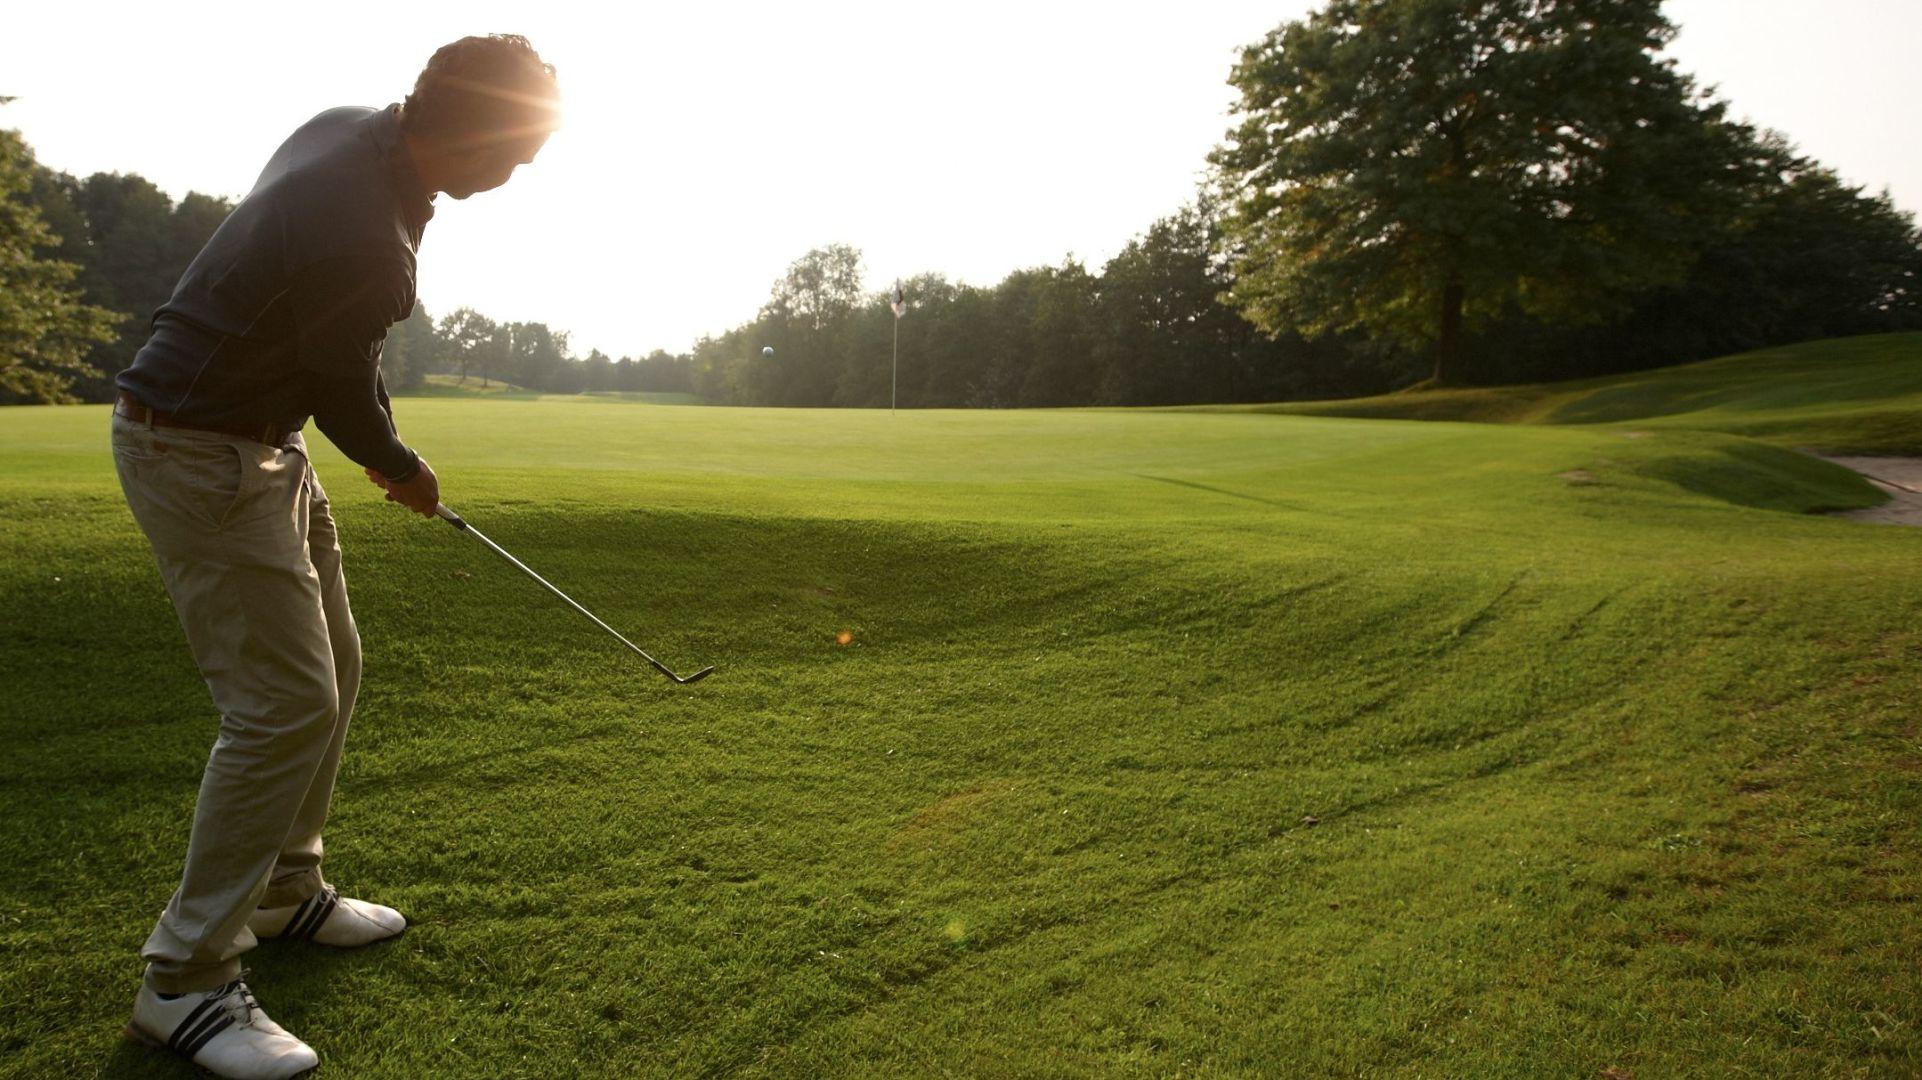 Golfplatz in Düsseldorf